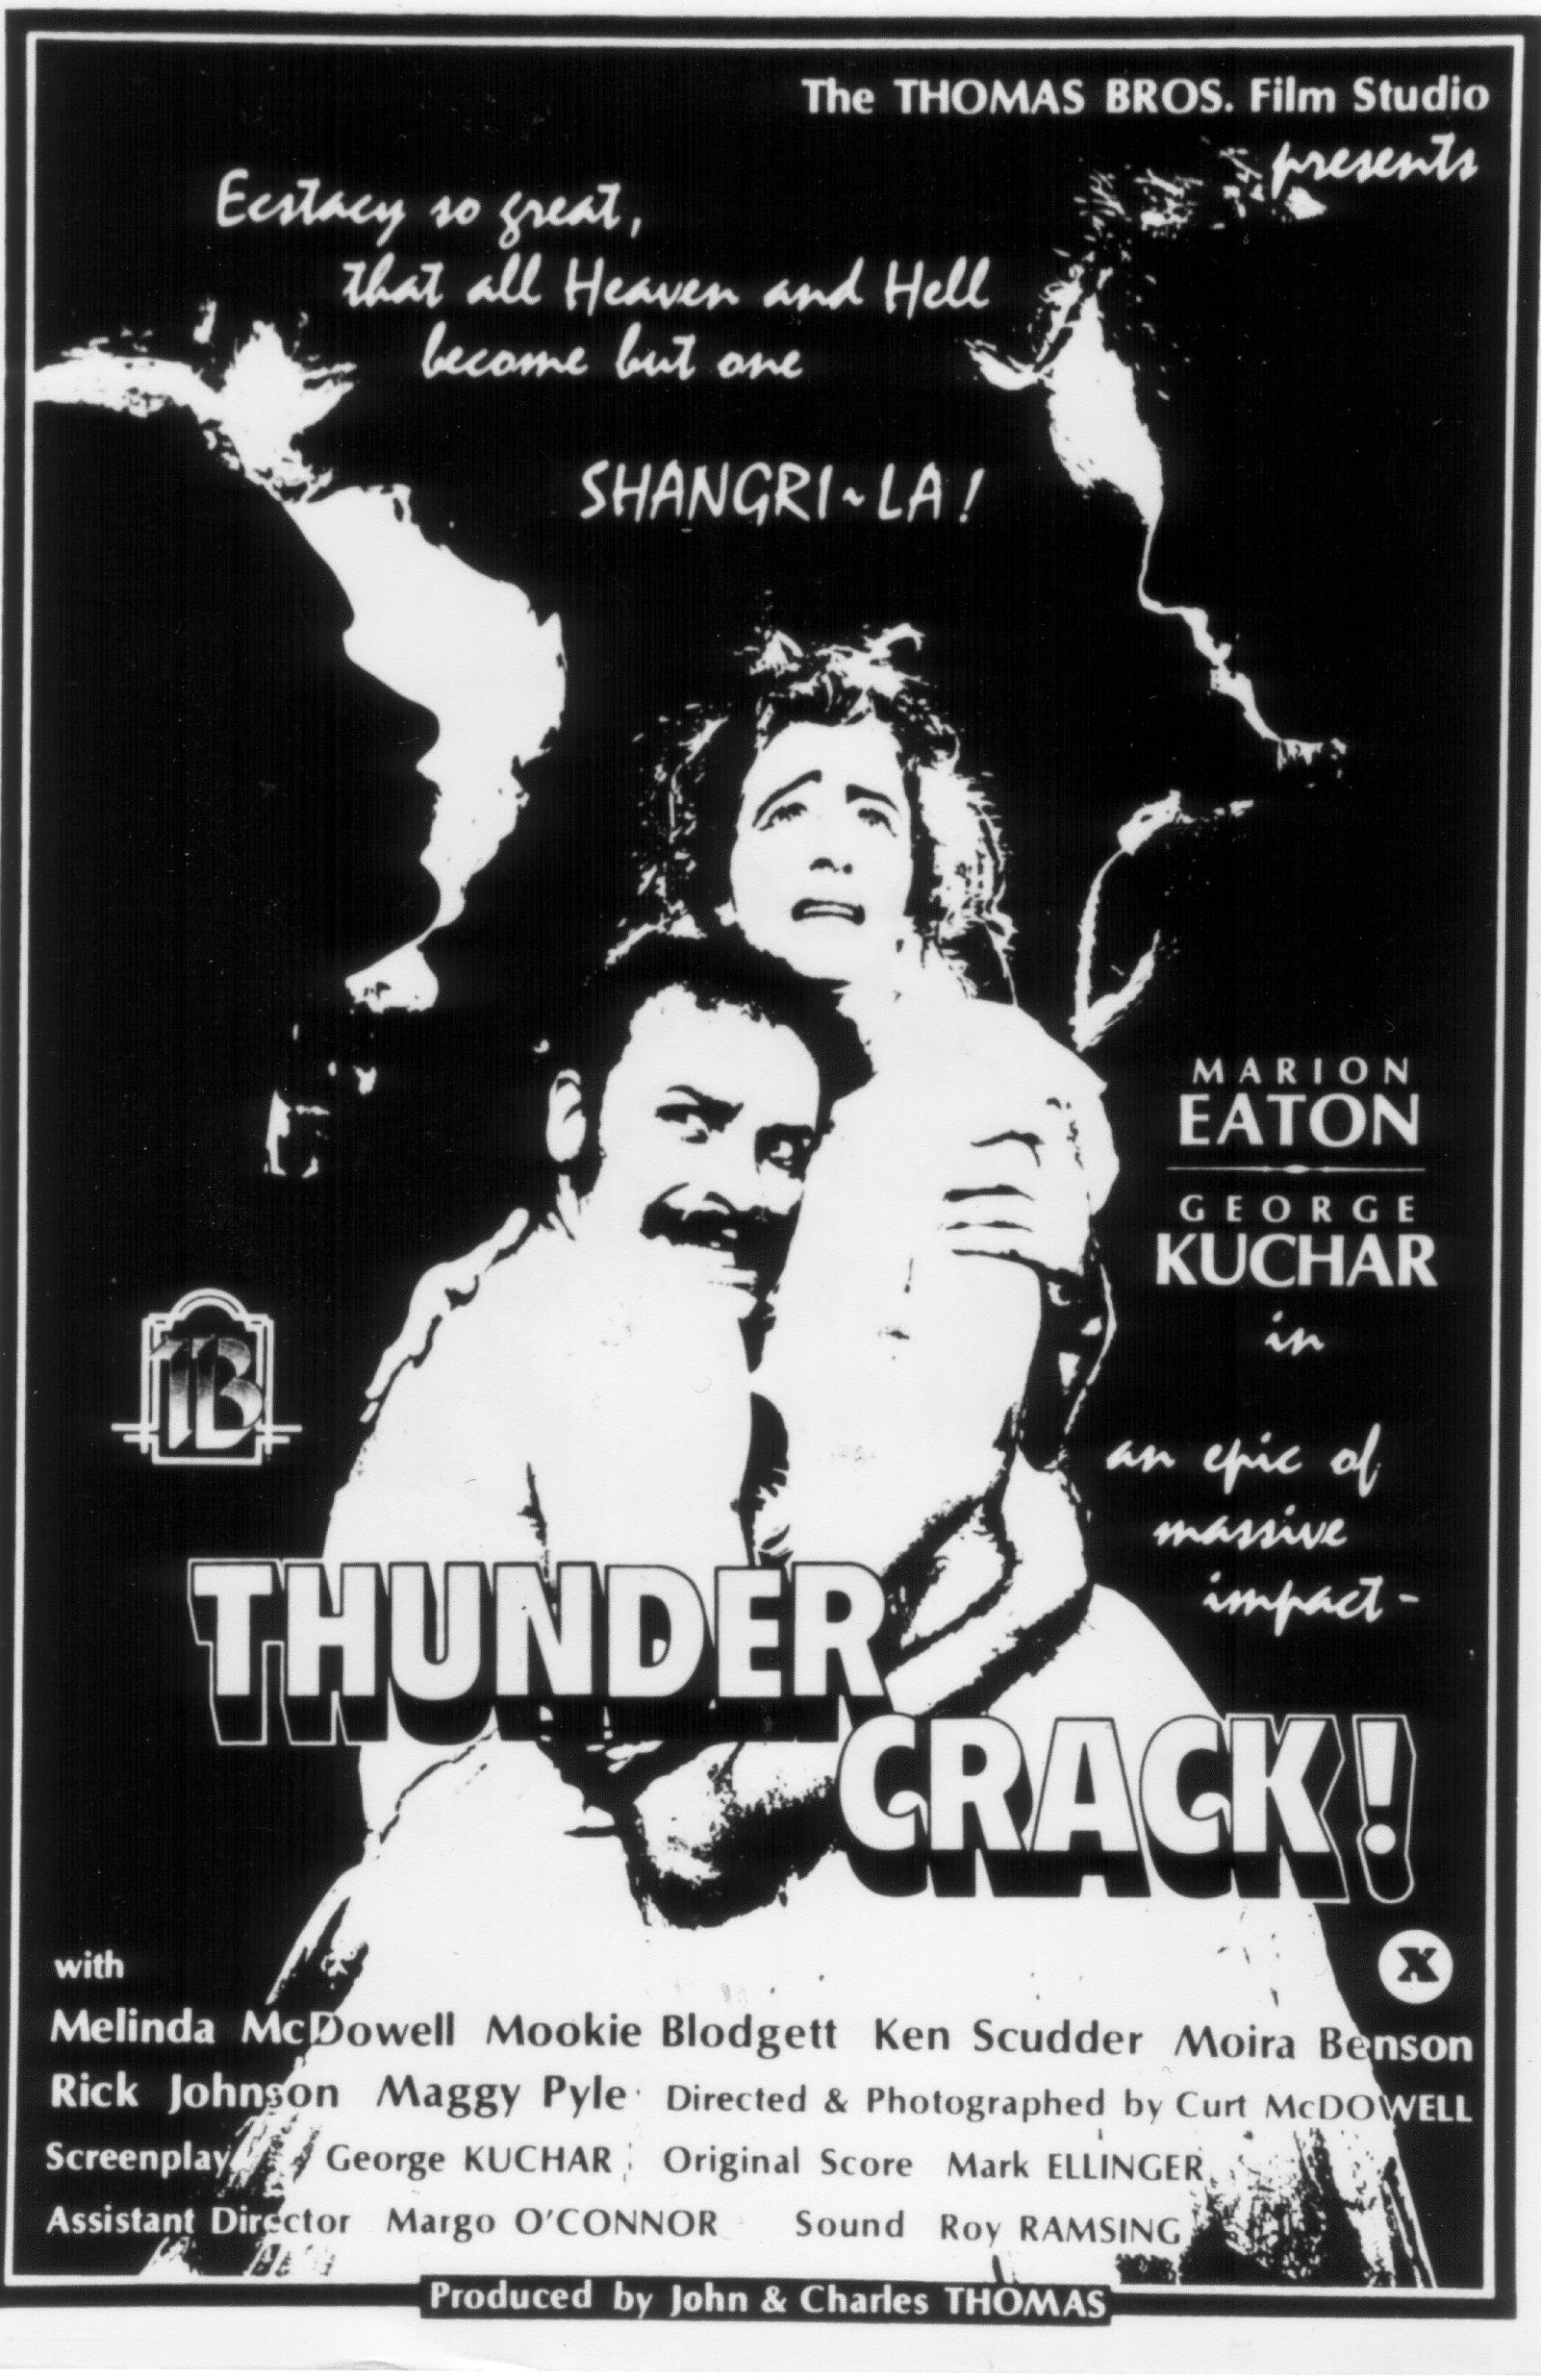 Thundercrack!2